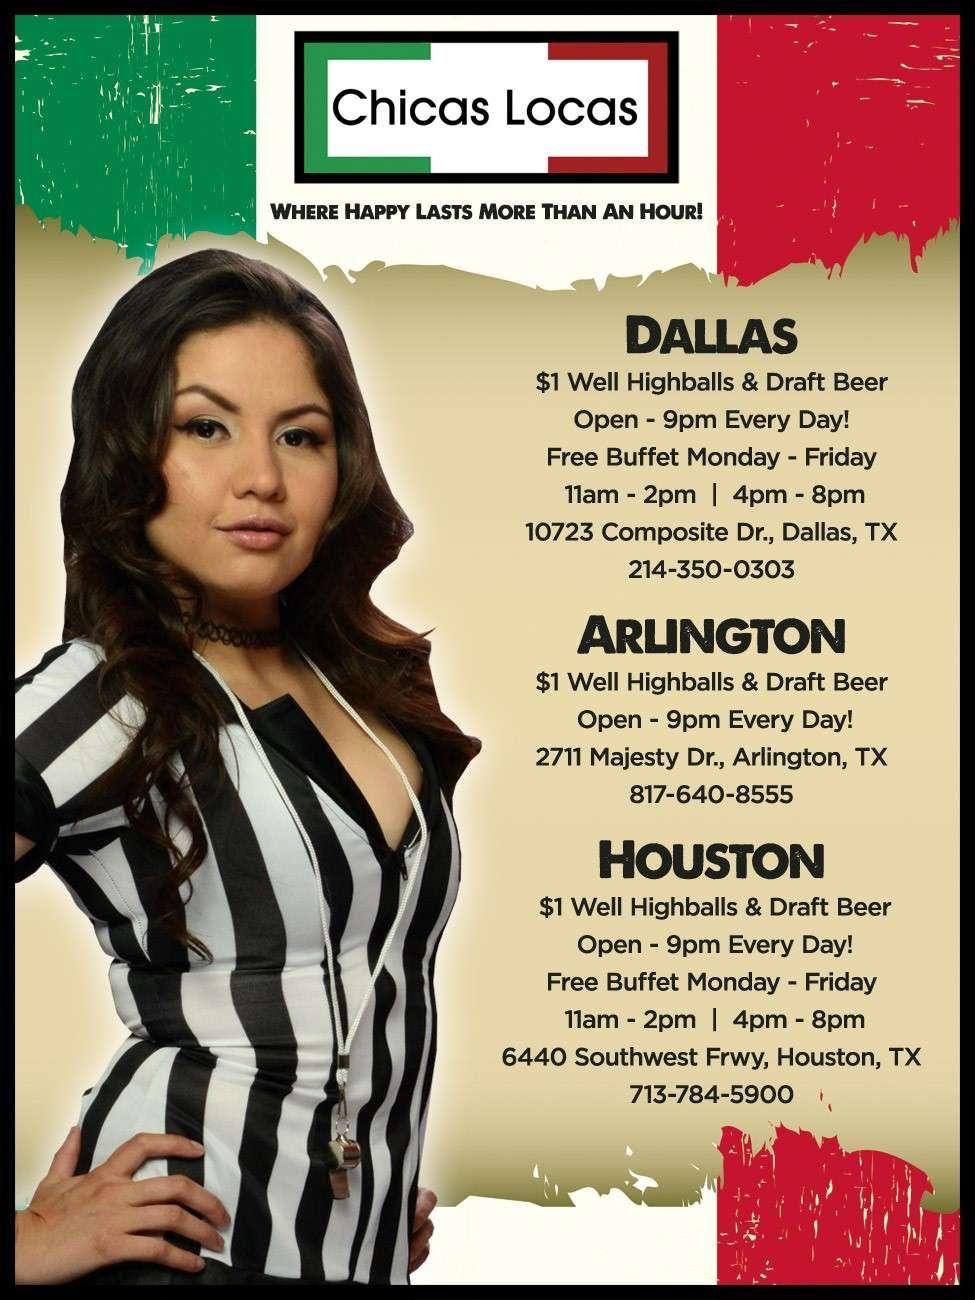 Chicas Locas of Cabaret Royale - night club  | Photo 5 of 6 | Address: 10723 Composite Dr, Dallas, TX 75220, USA | Phone: (214) 350-0303